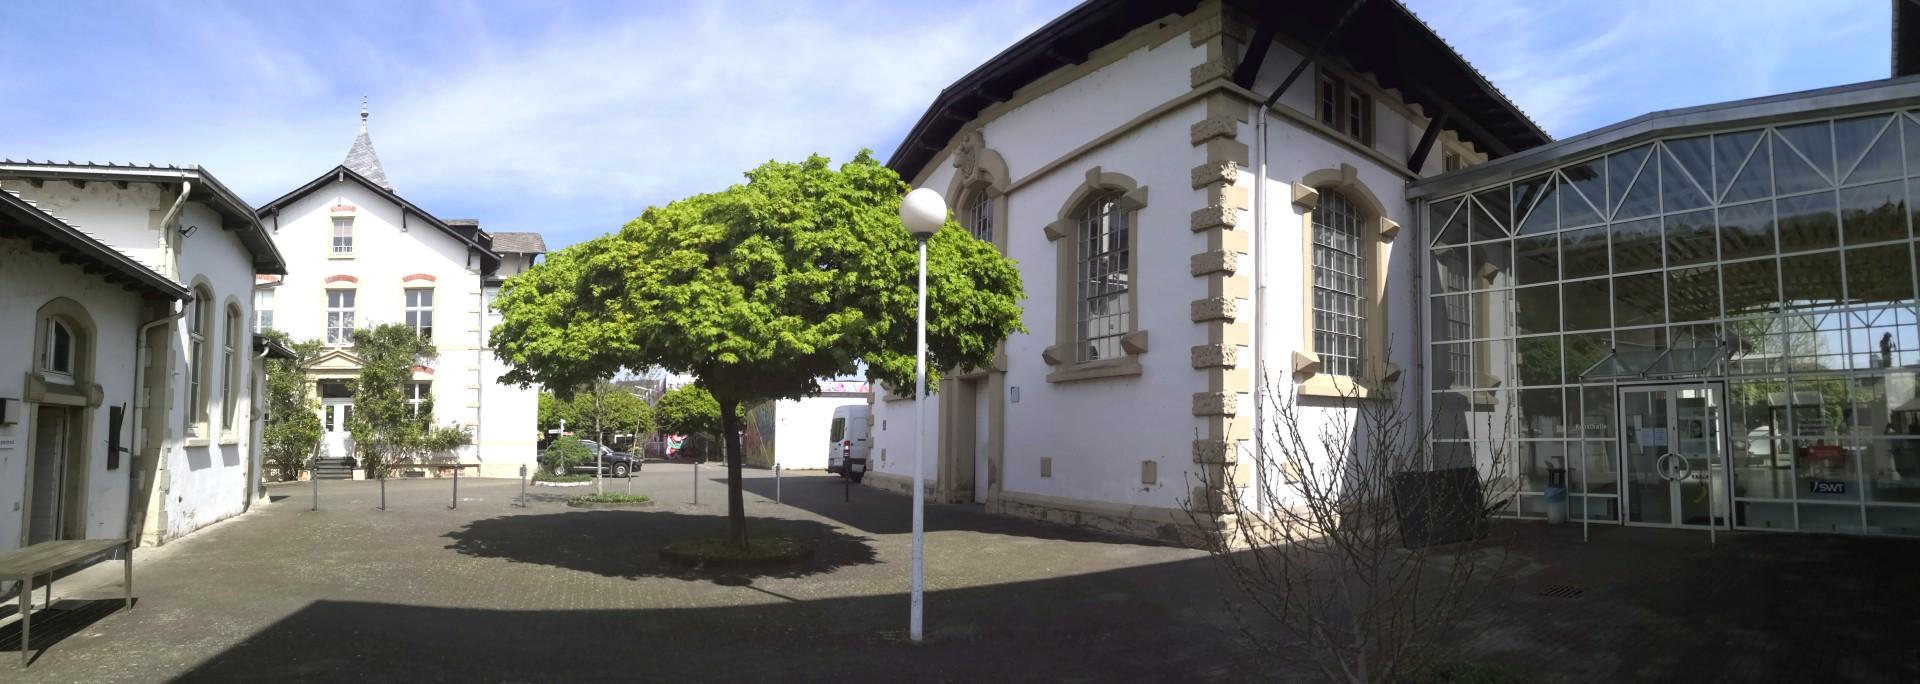 Europäische Kunstakademie e.V.